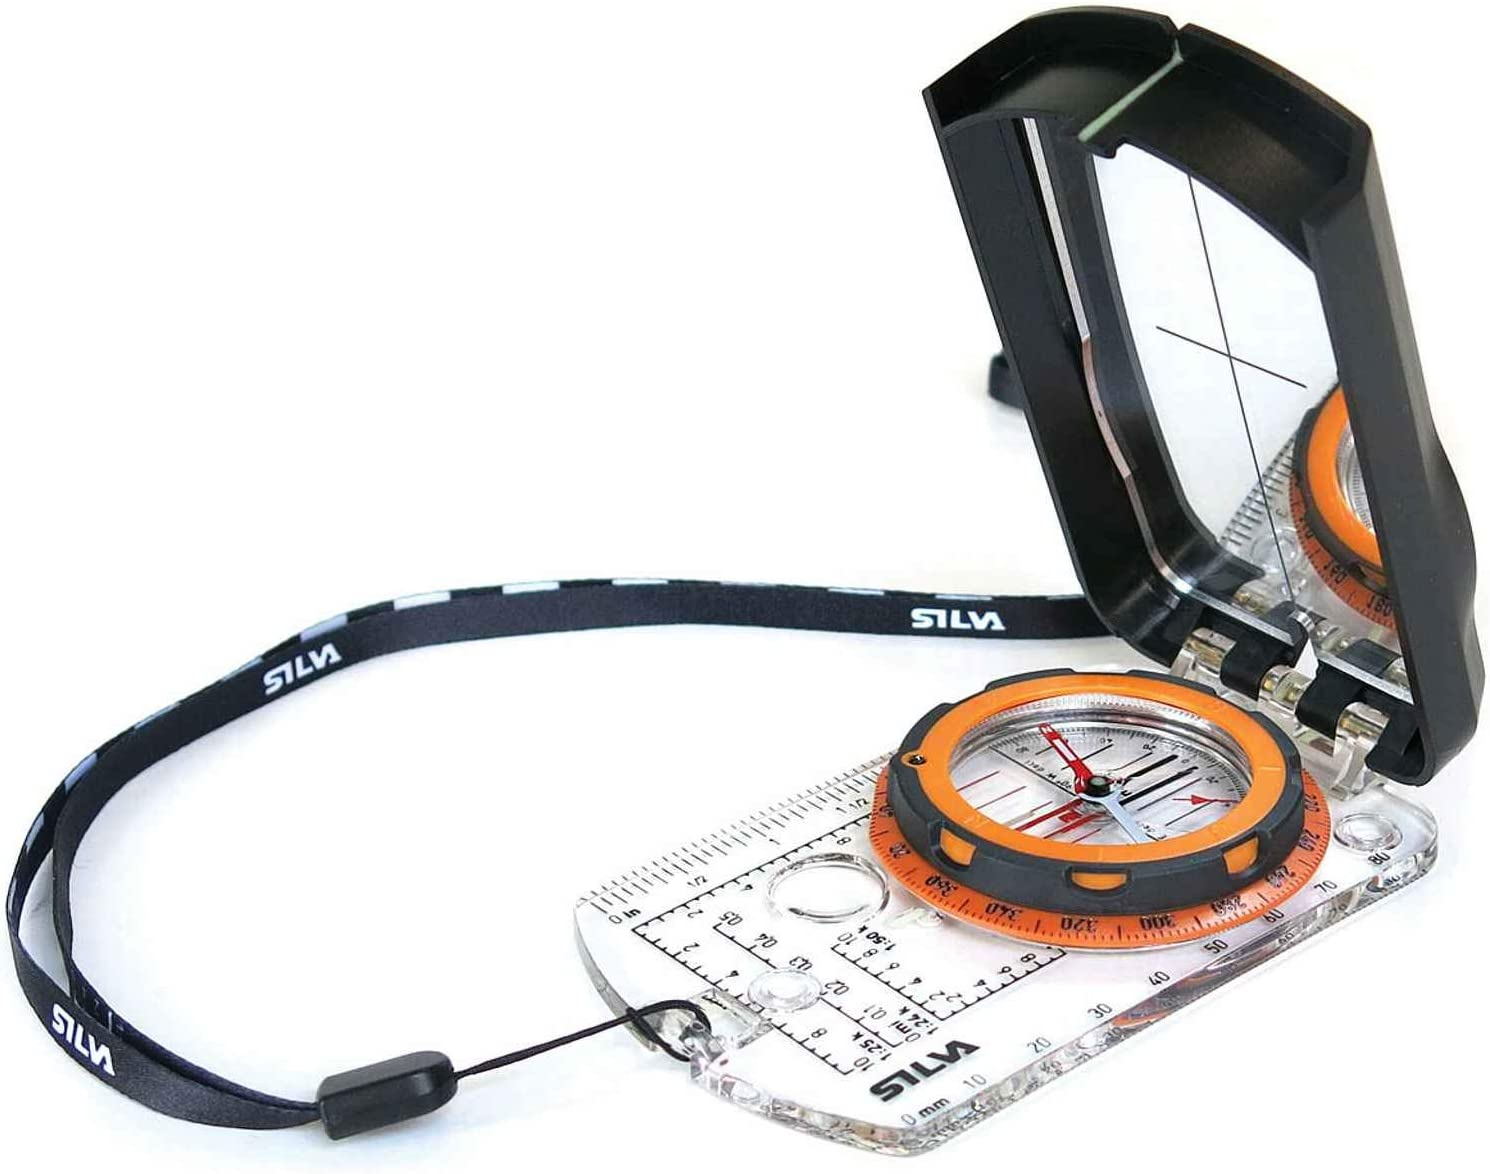 Silva Ranger 2.0 Compass - Orange : Sports & Outdoors